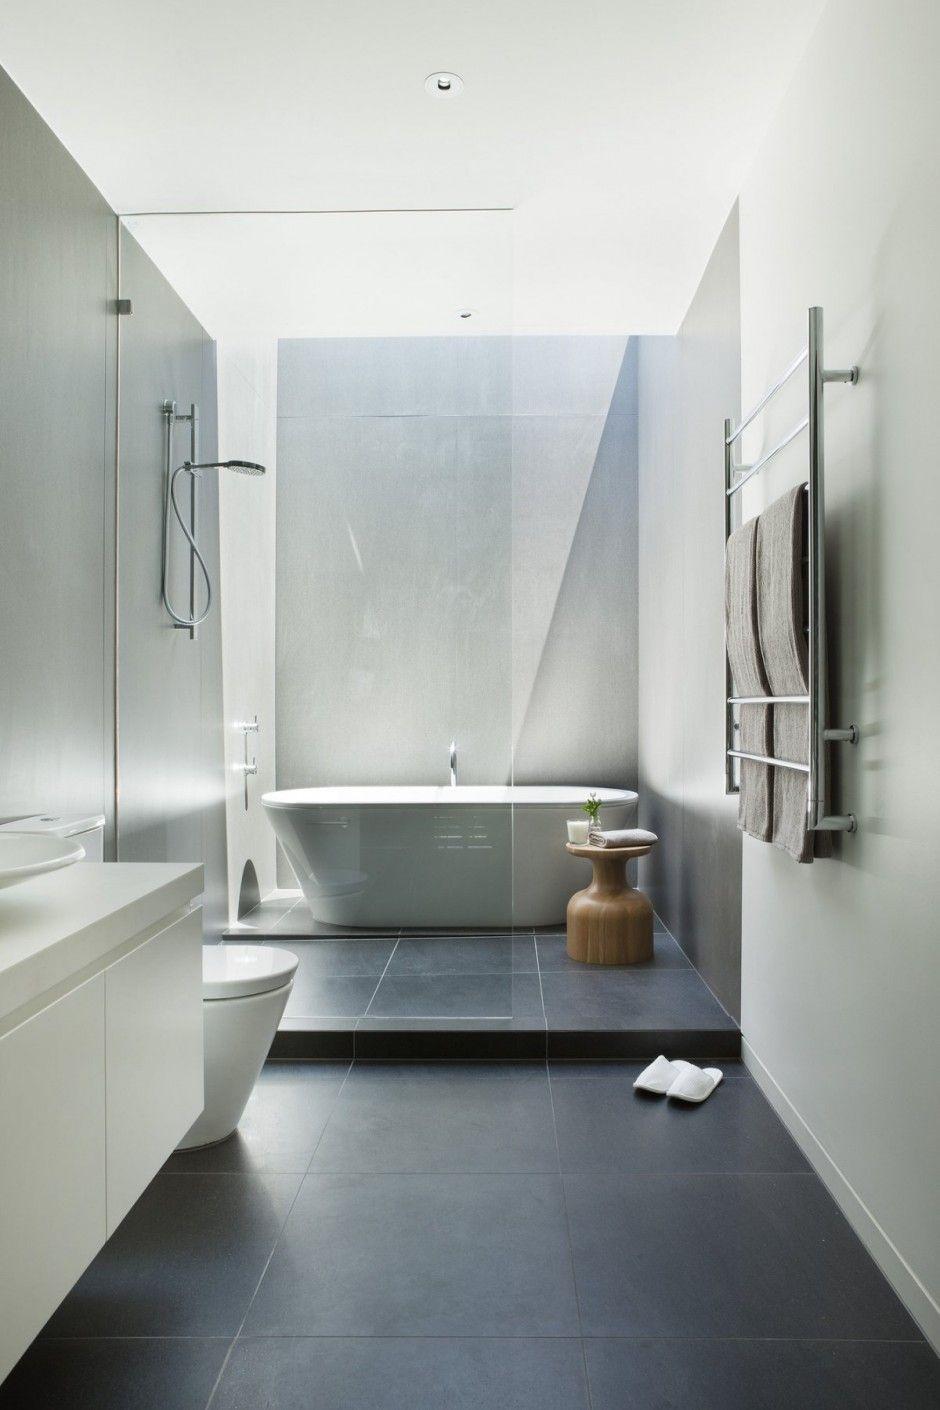 Stylish Bathroom   Carol Johnson   Pinterest   Sustainable design ...